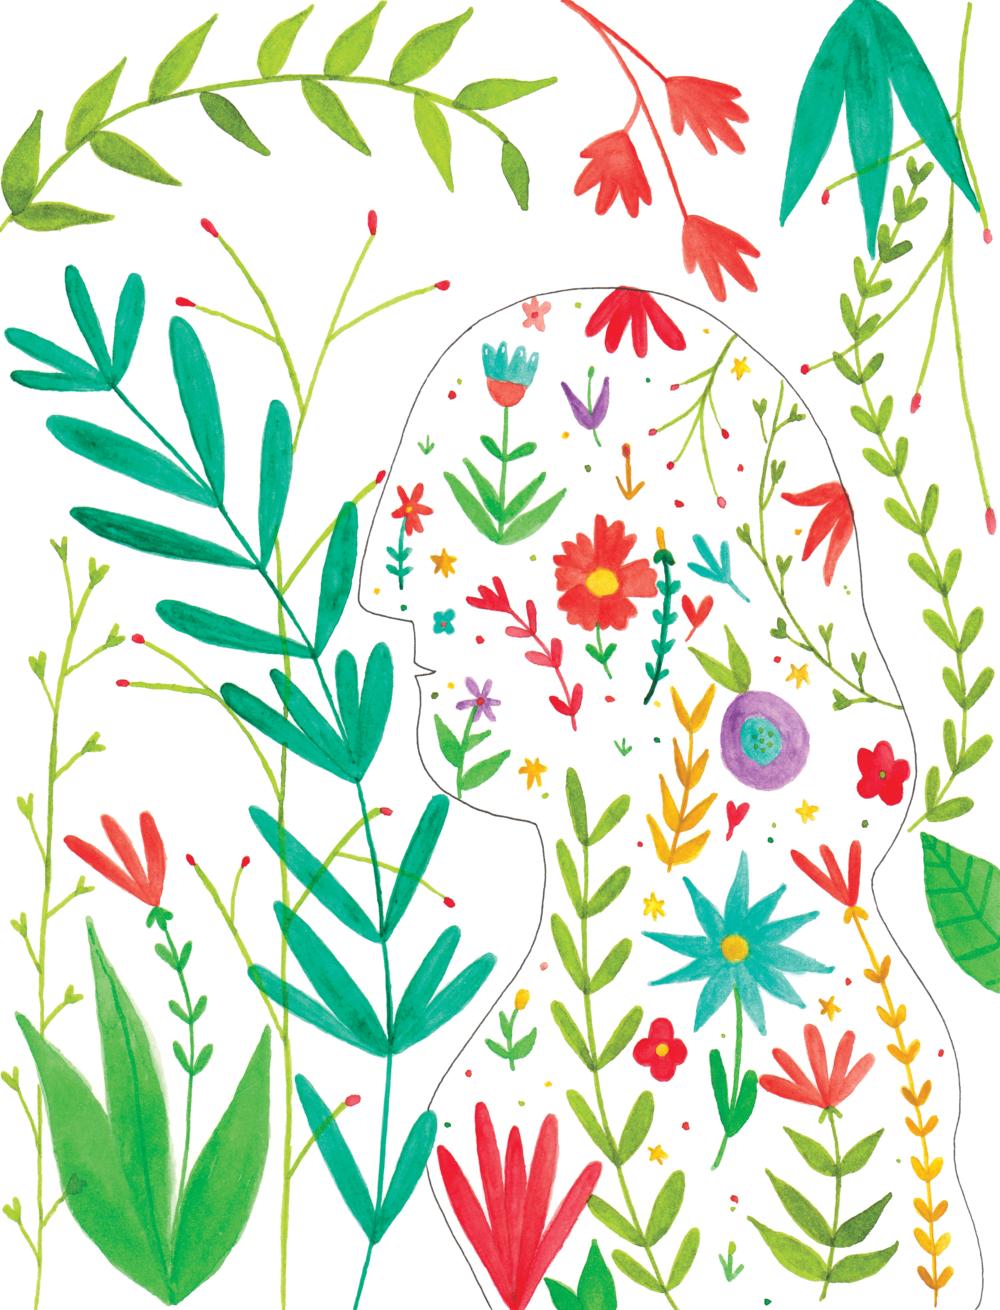 Concha Espina - -illustration